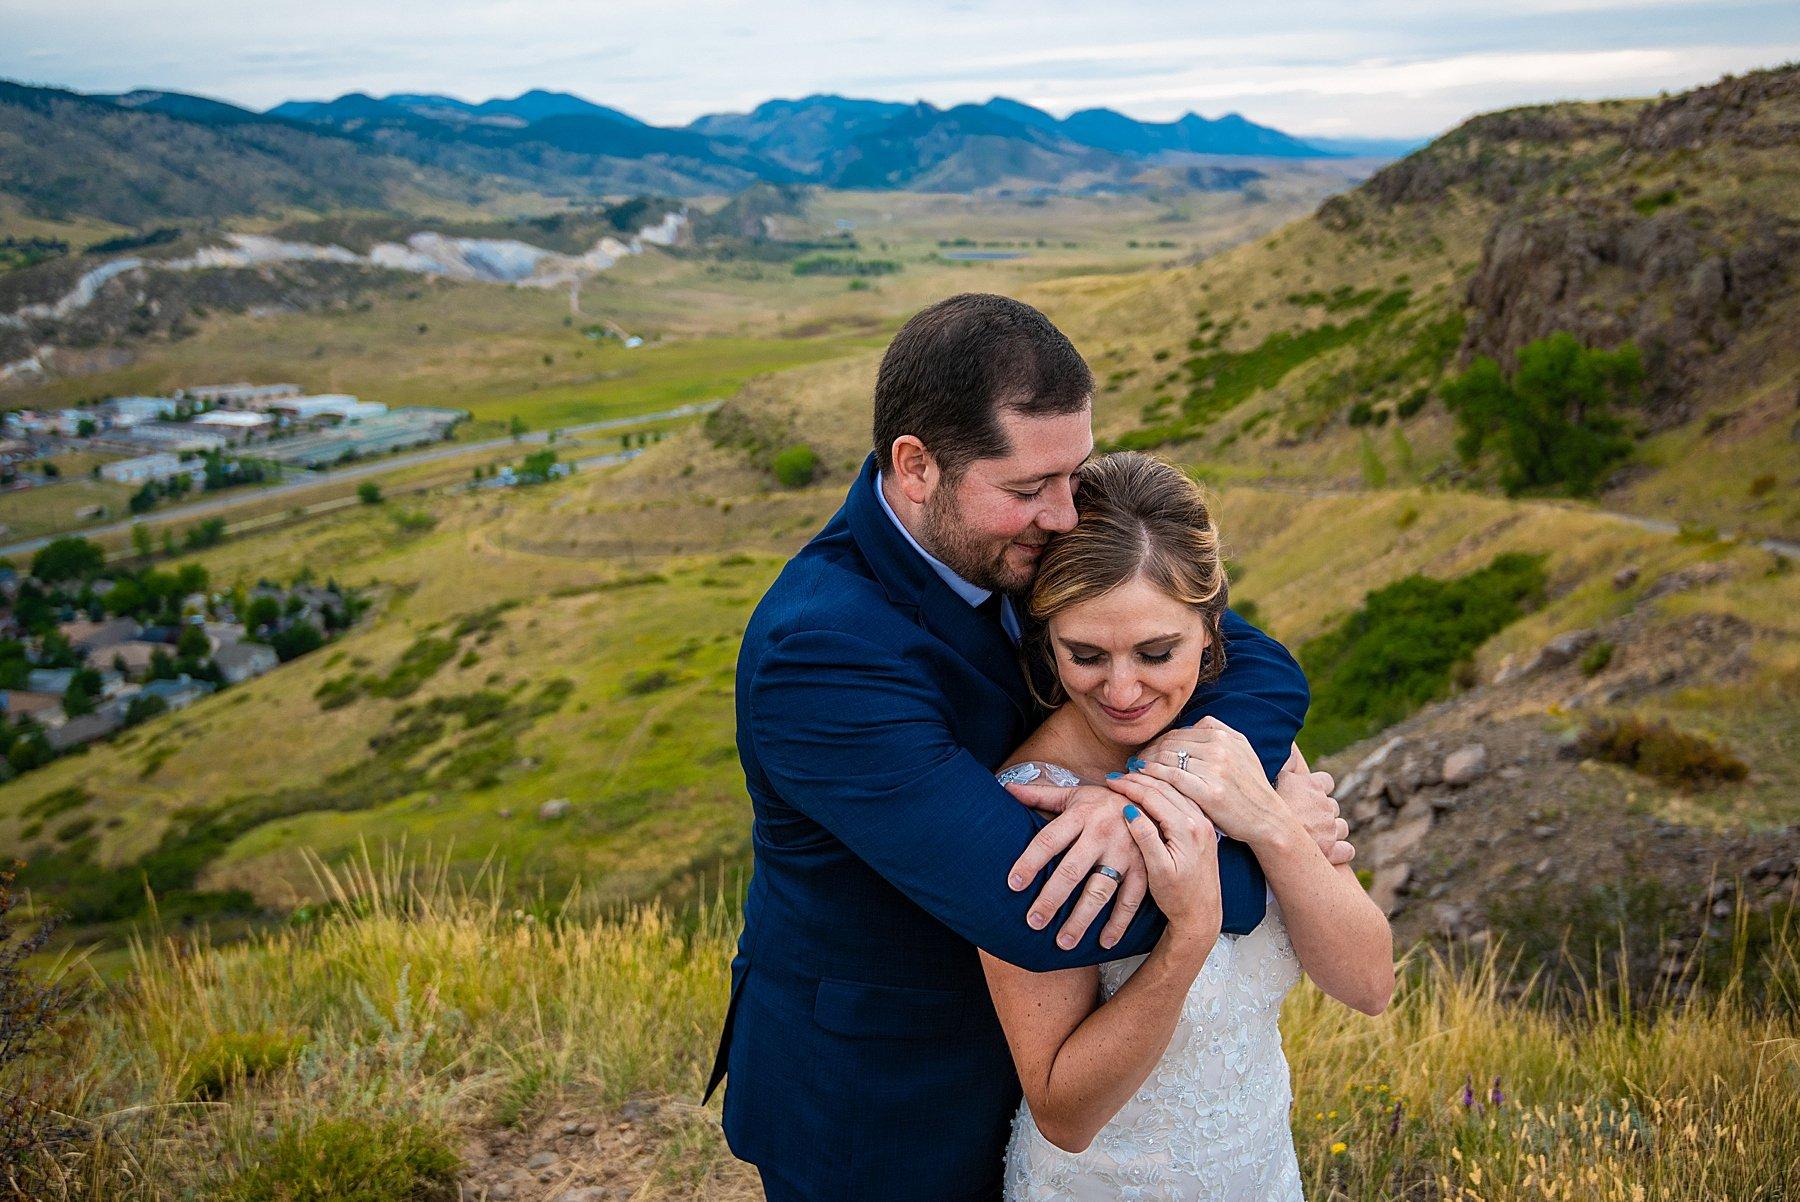 north table mountain elopement photographer colorado